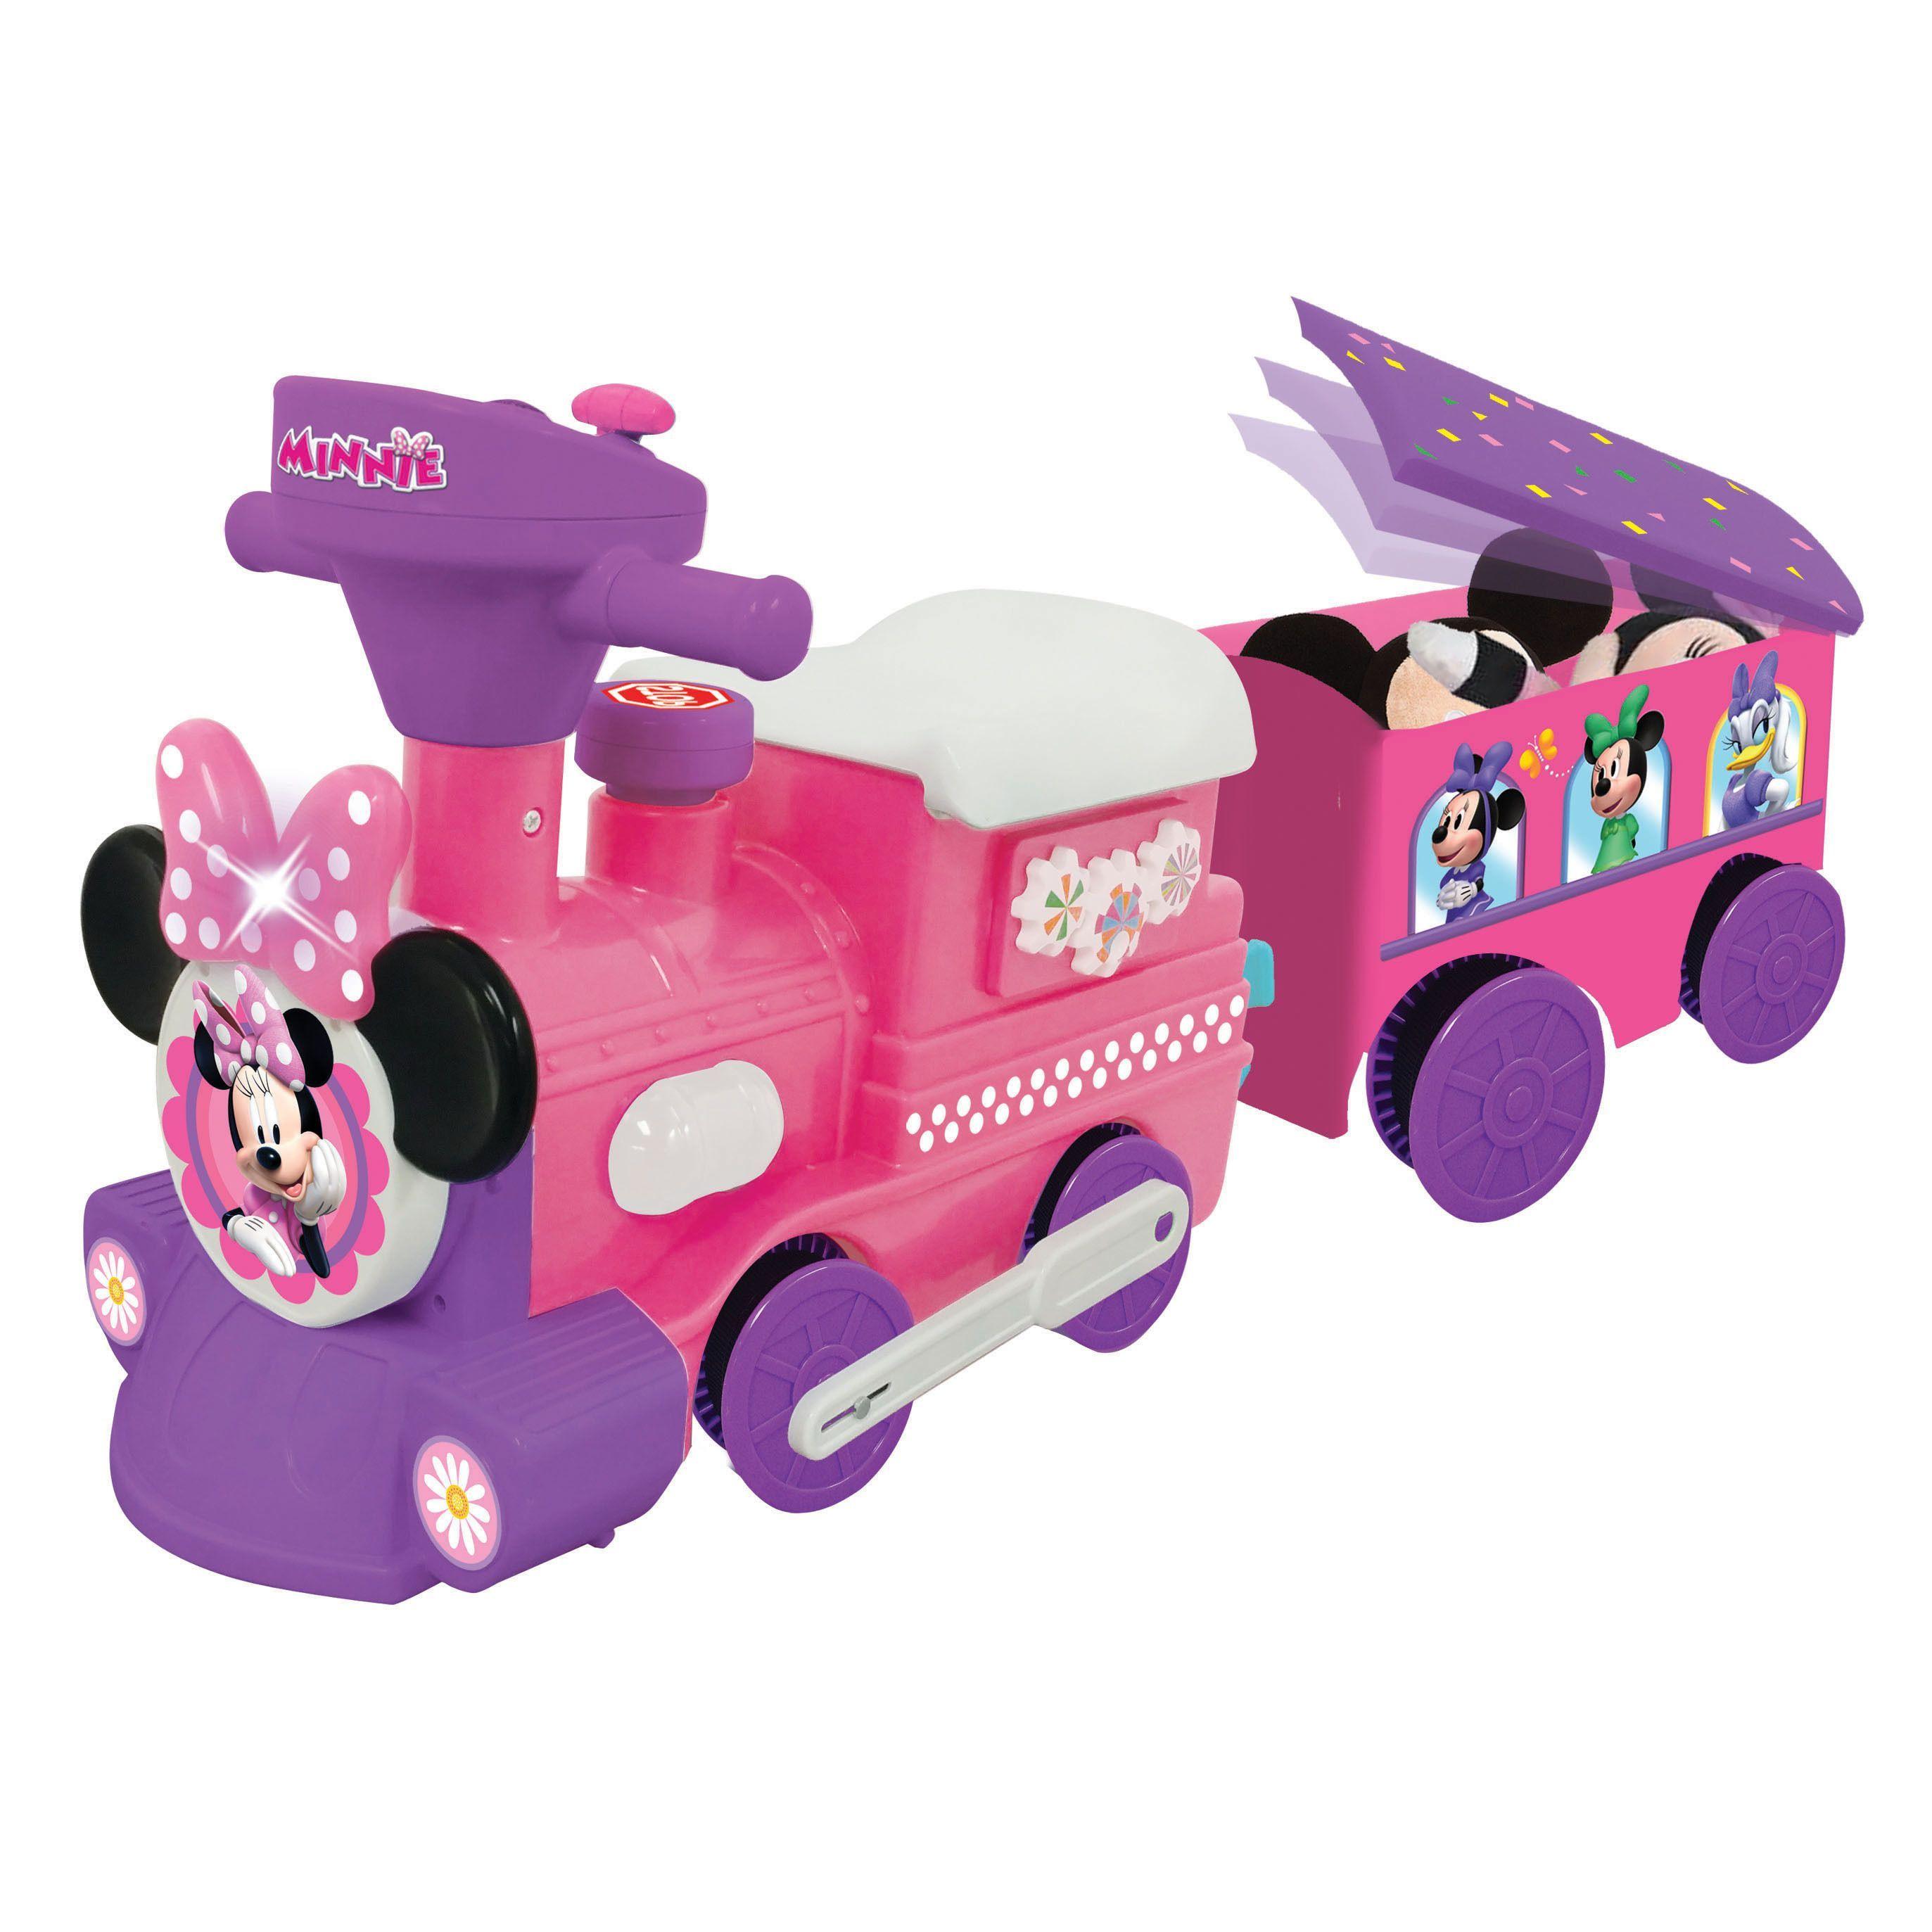 Kiddieland Disney Minnie Mouse Ride On Motorized Train